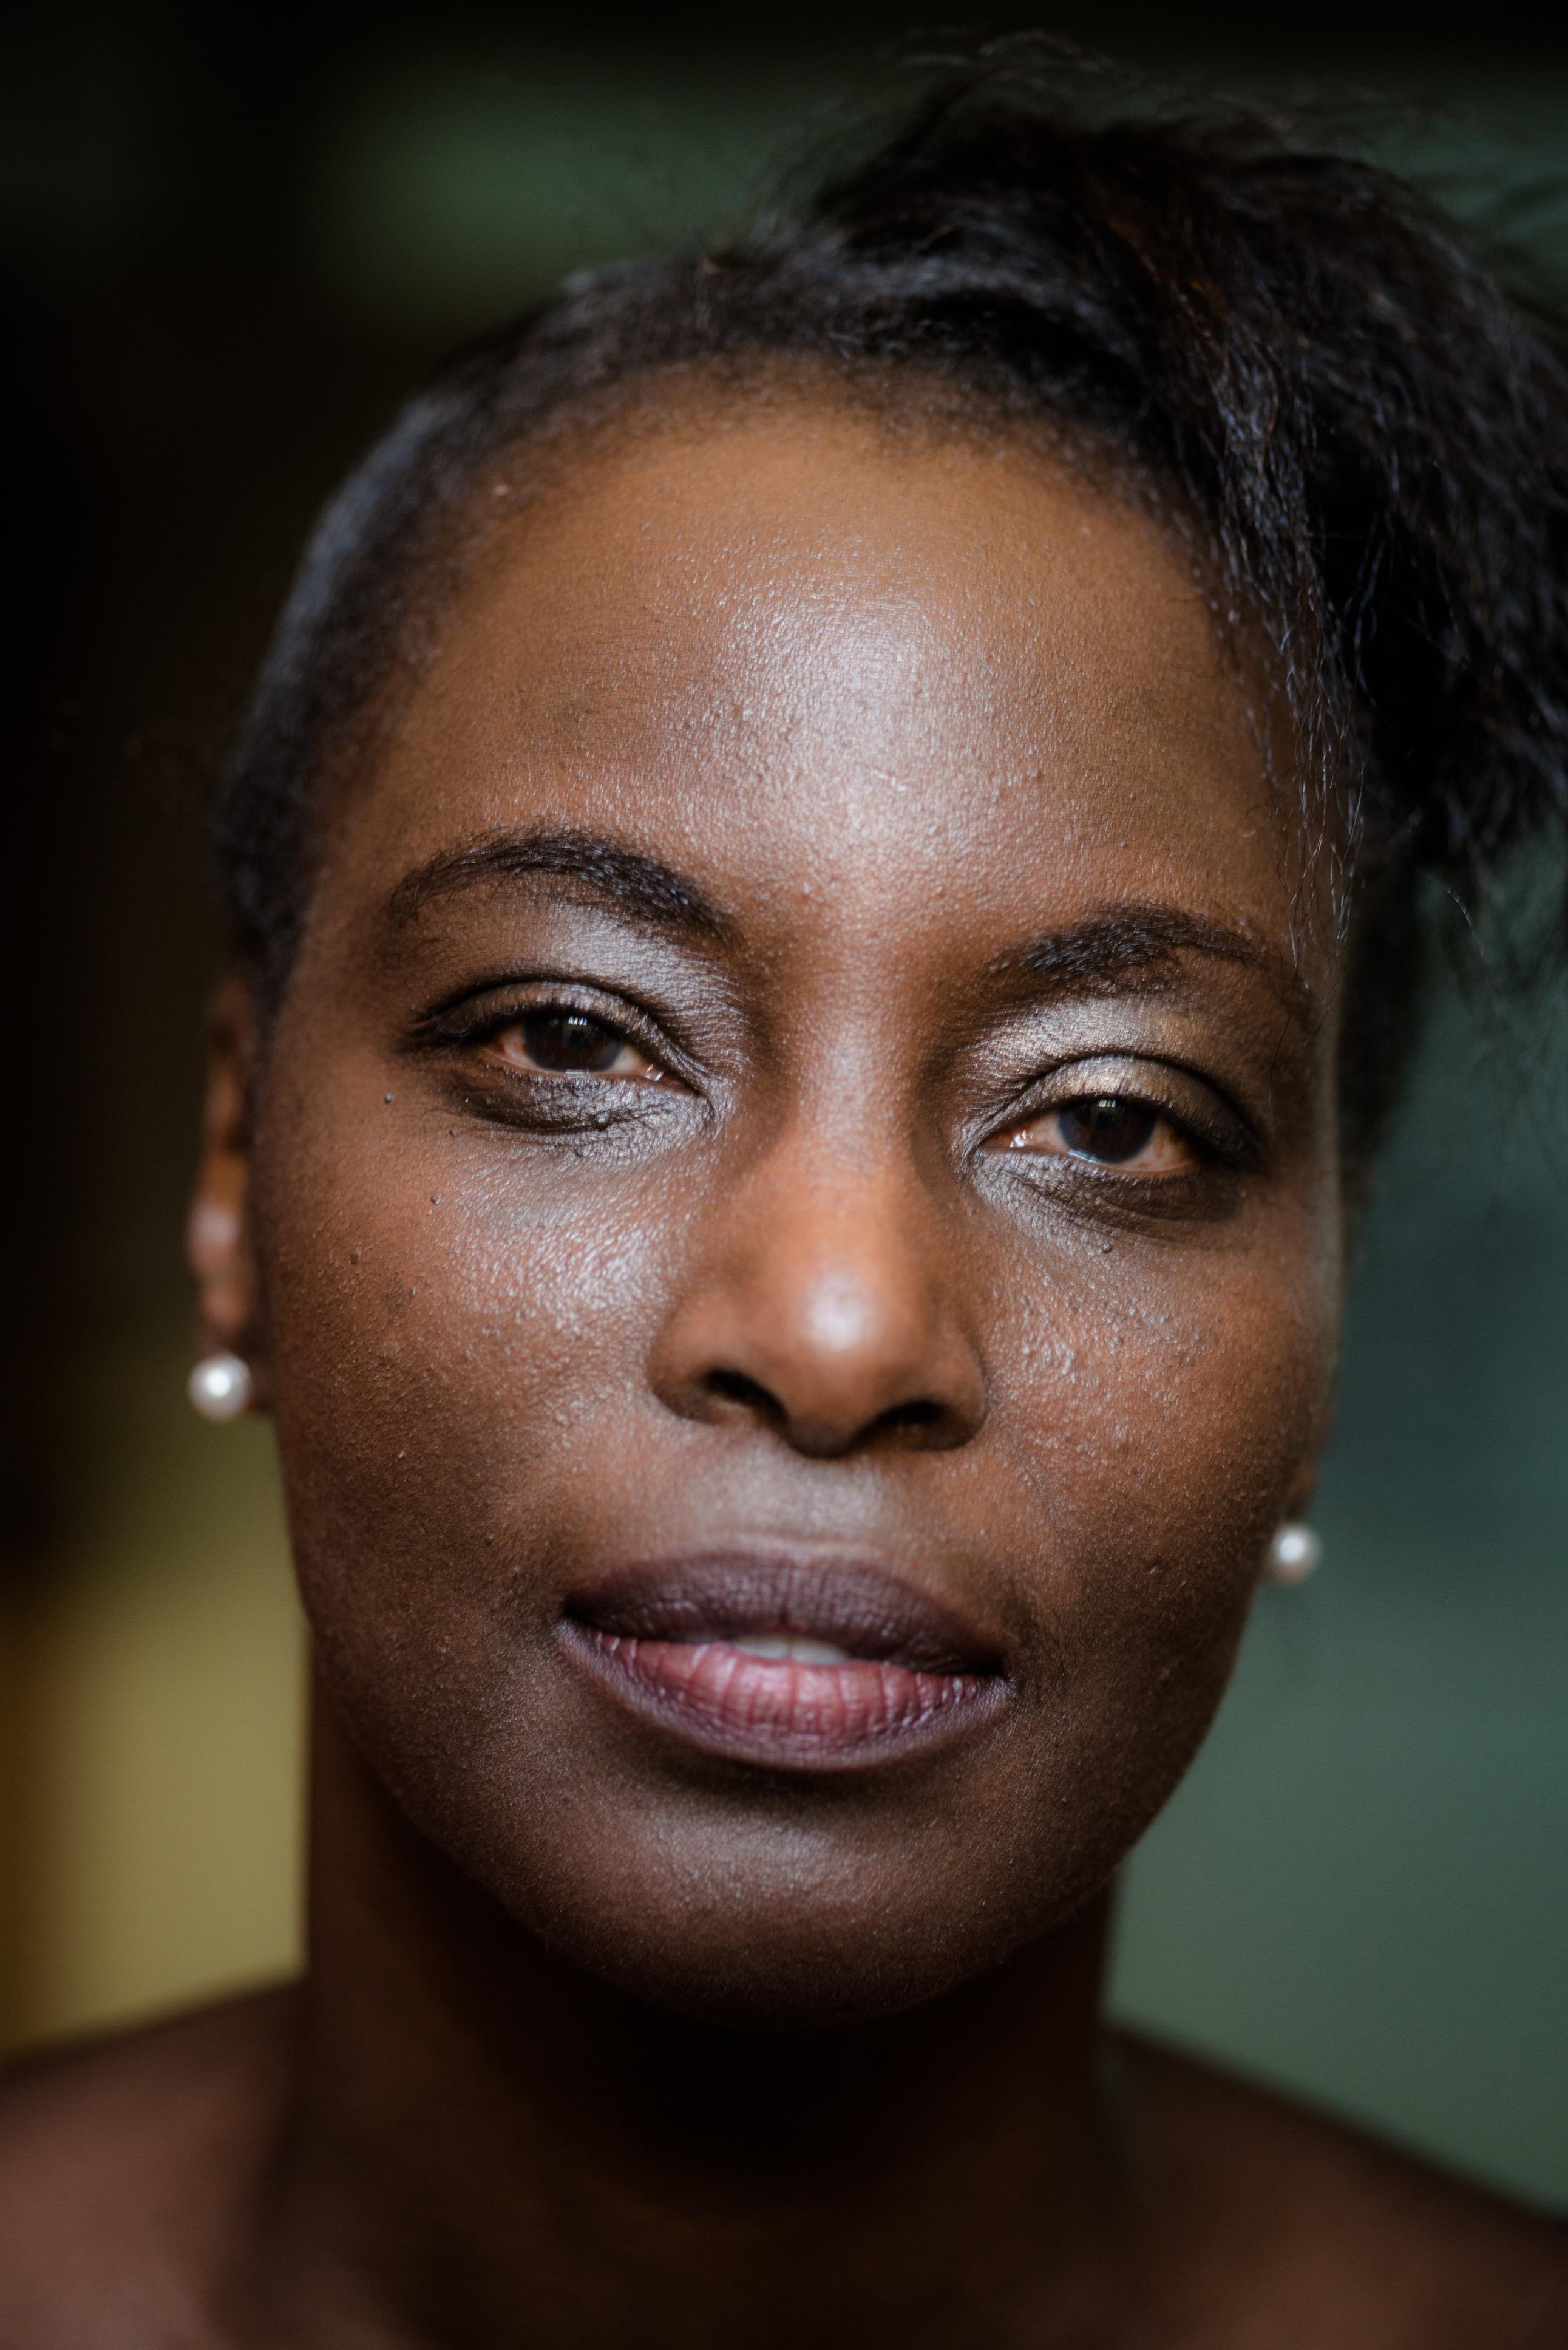 Yvonne Adhiambo Owuor image